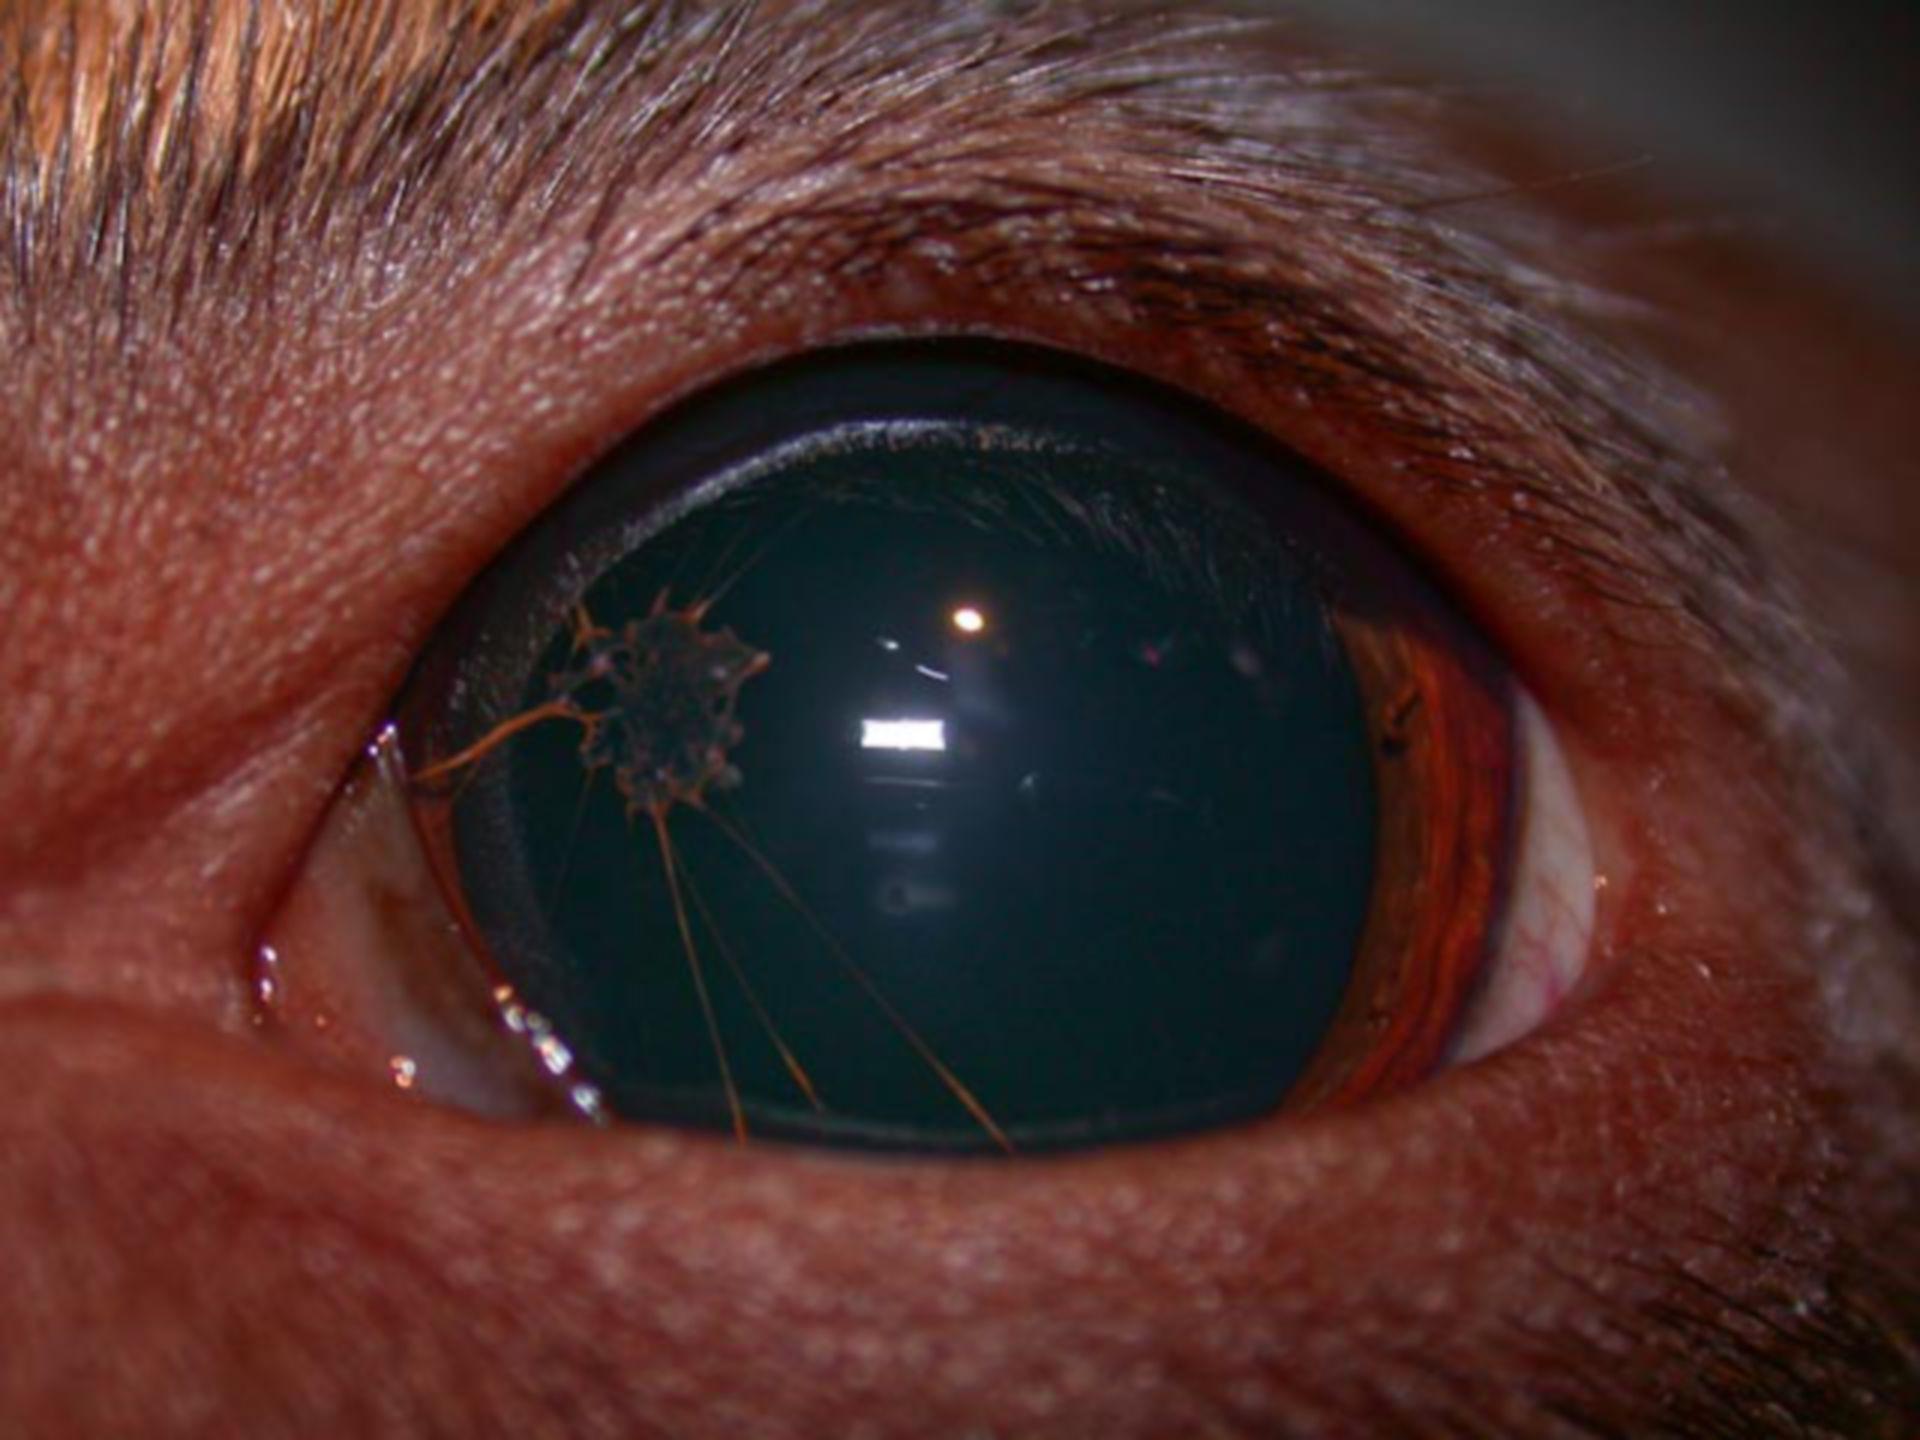 Veterinary medicine: Persisting Pupillar Membrane